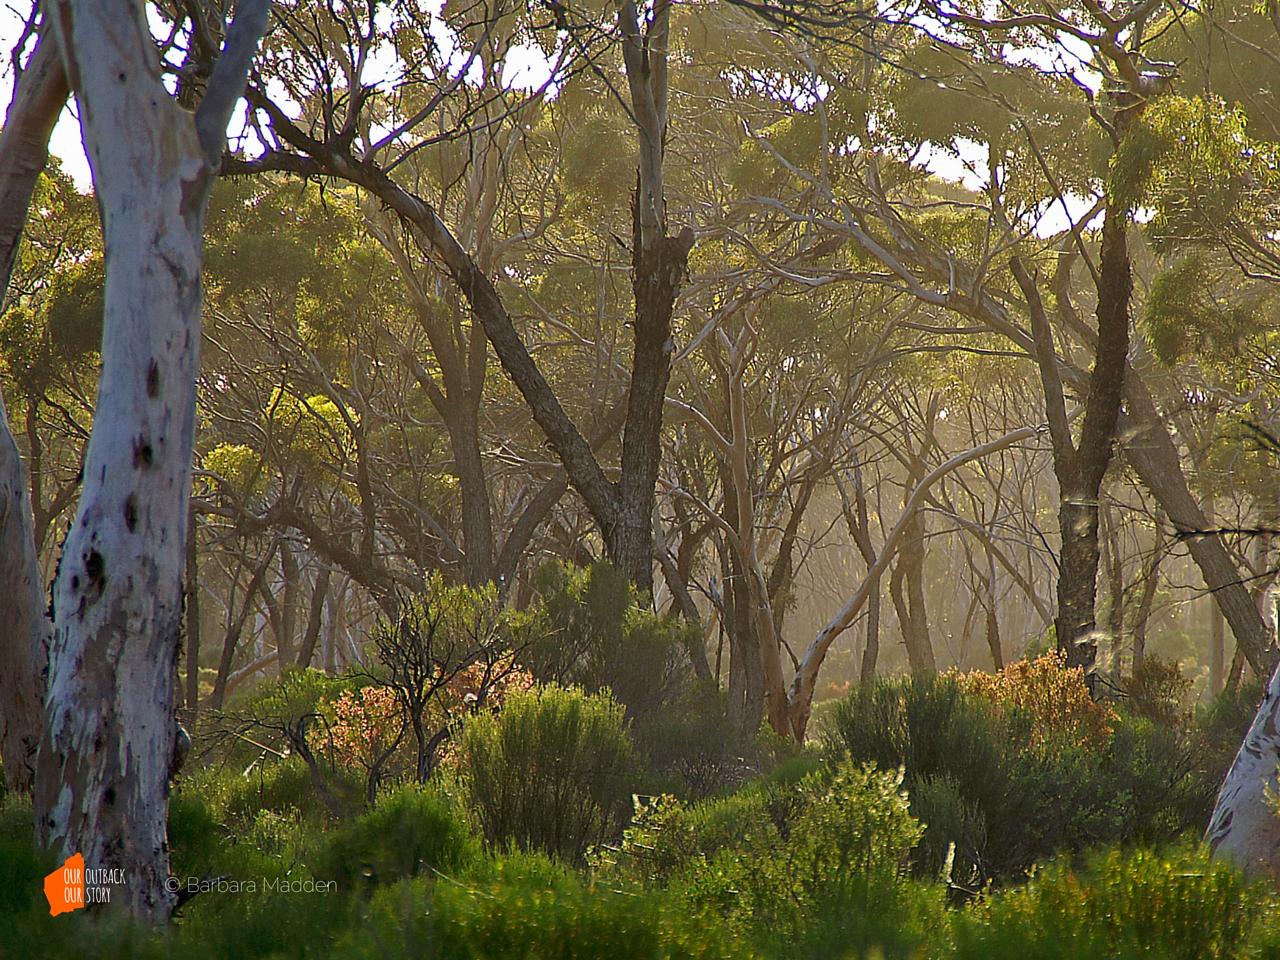 Great_Western_Woodlands-Barbara_Madden